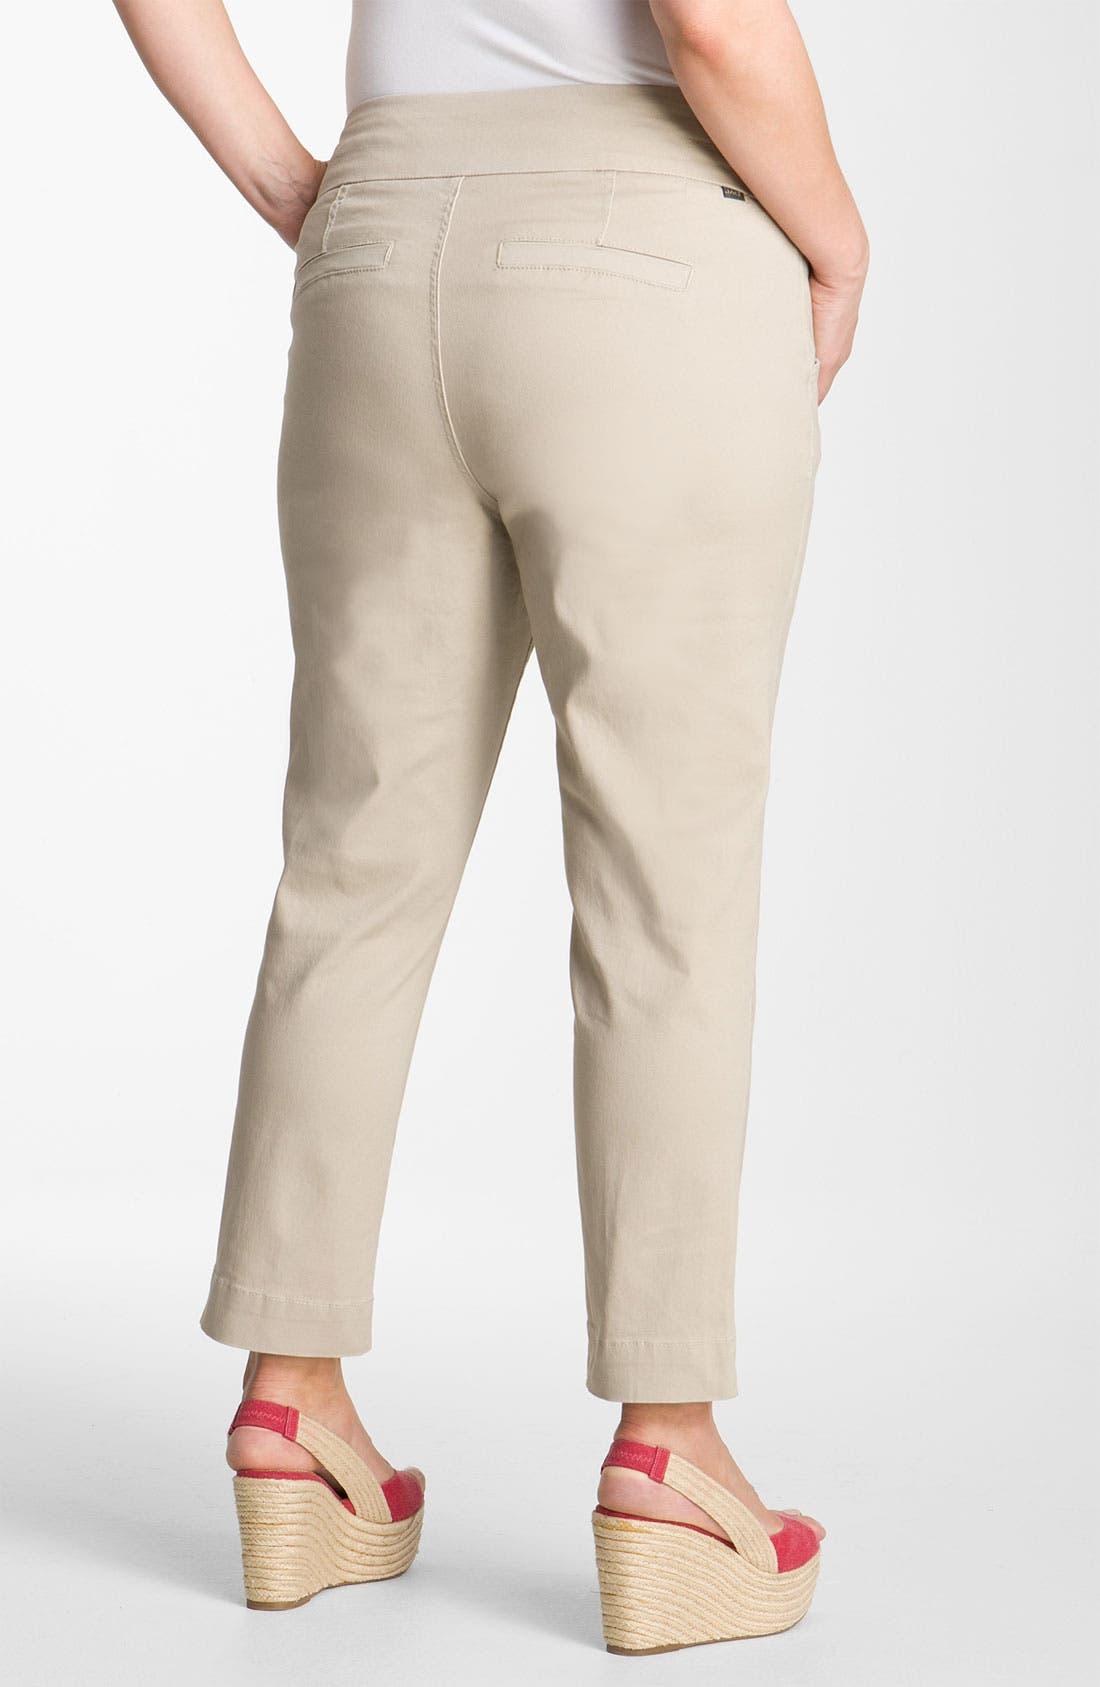 Alternate Image 2  - Jag Jeans 'Attie' Slim Ankle Pants (Plus)